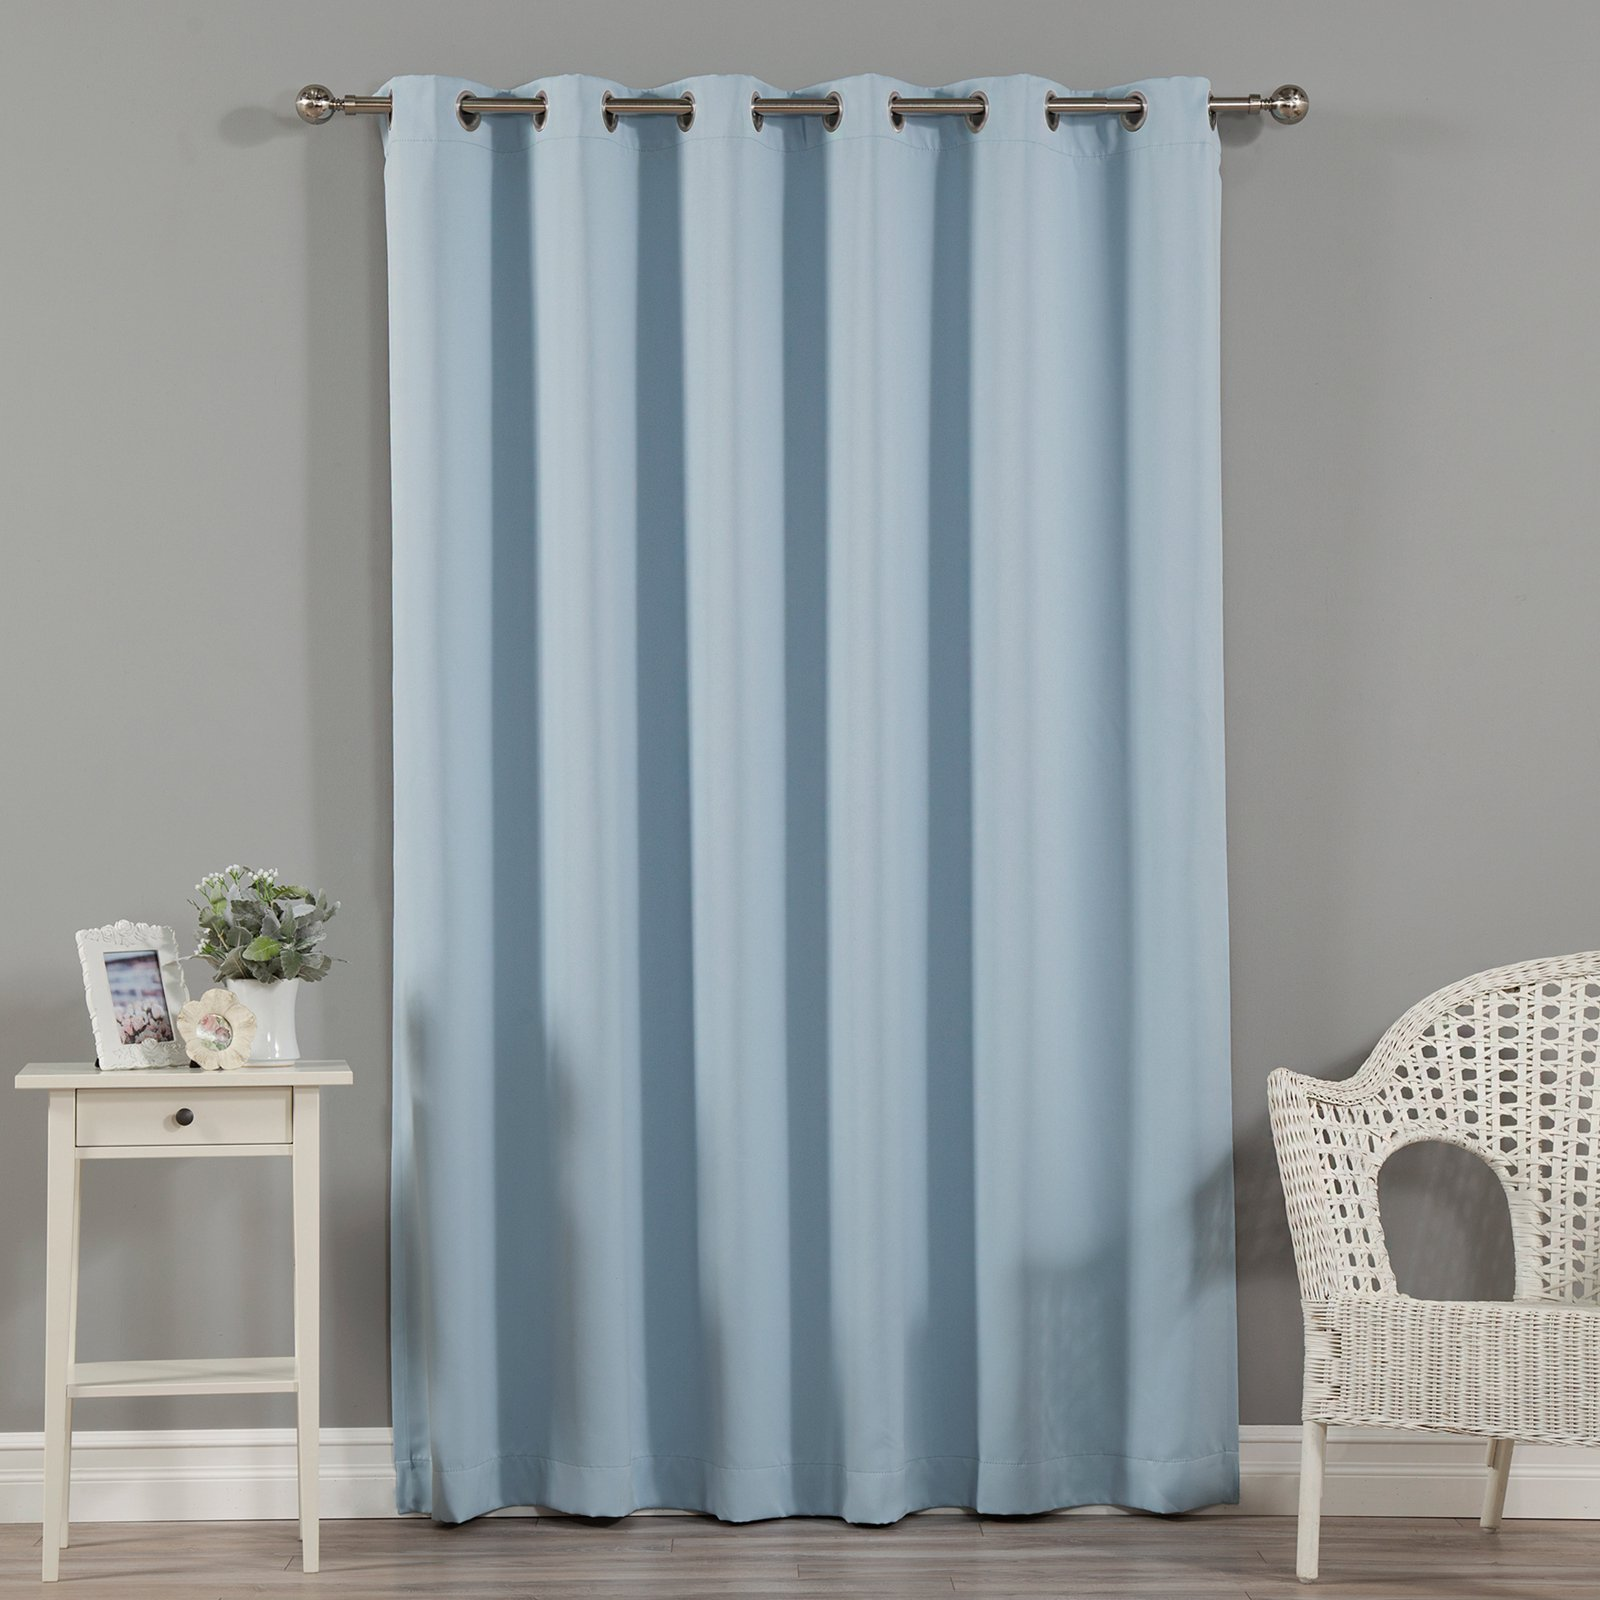 Best Home Fashion Wide Width Grommet Blackout Single Curtain Panel